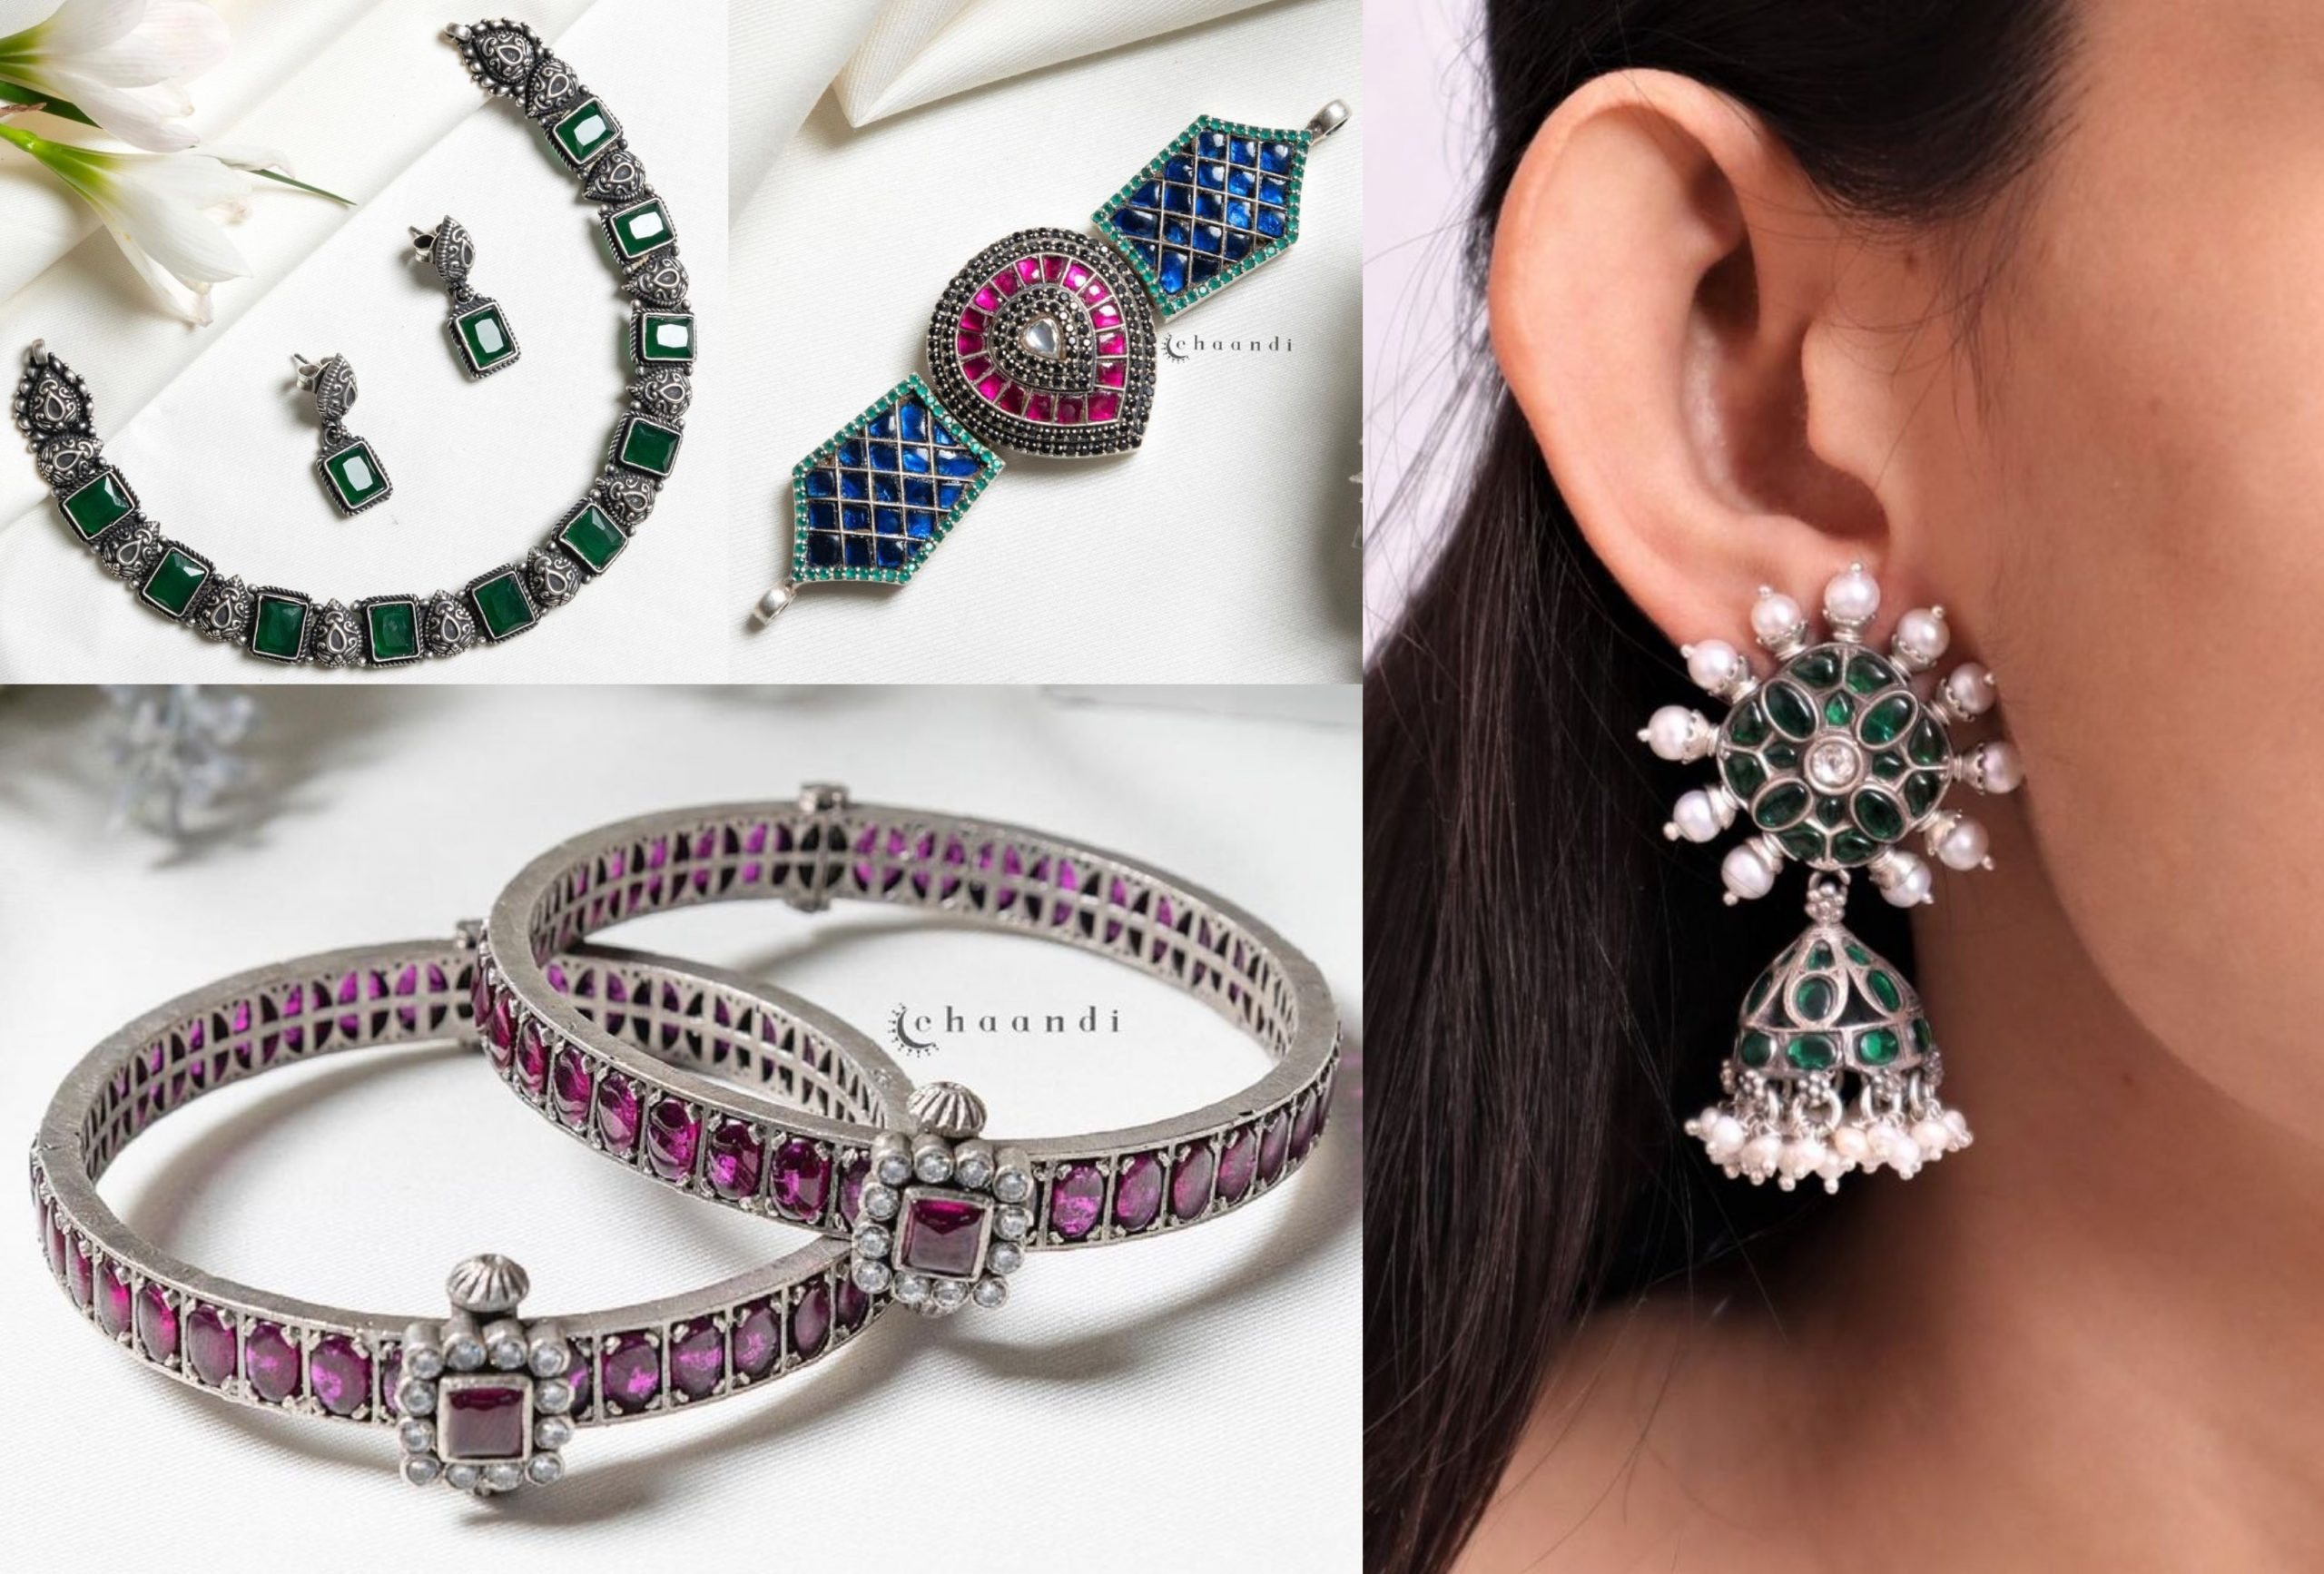 Stunning 92.5 Silver Jewellery By Chaandi